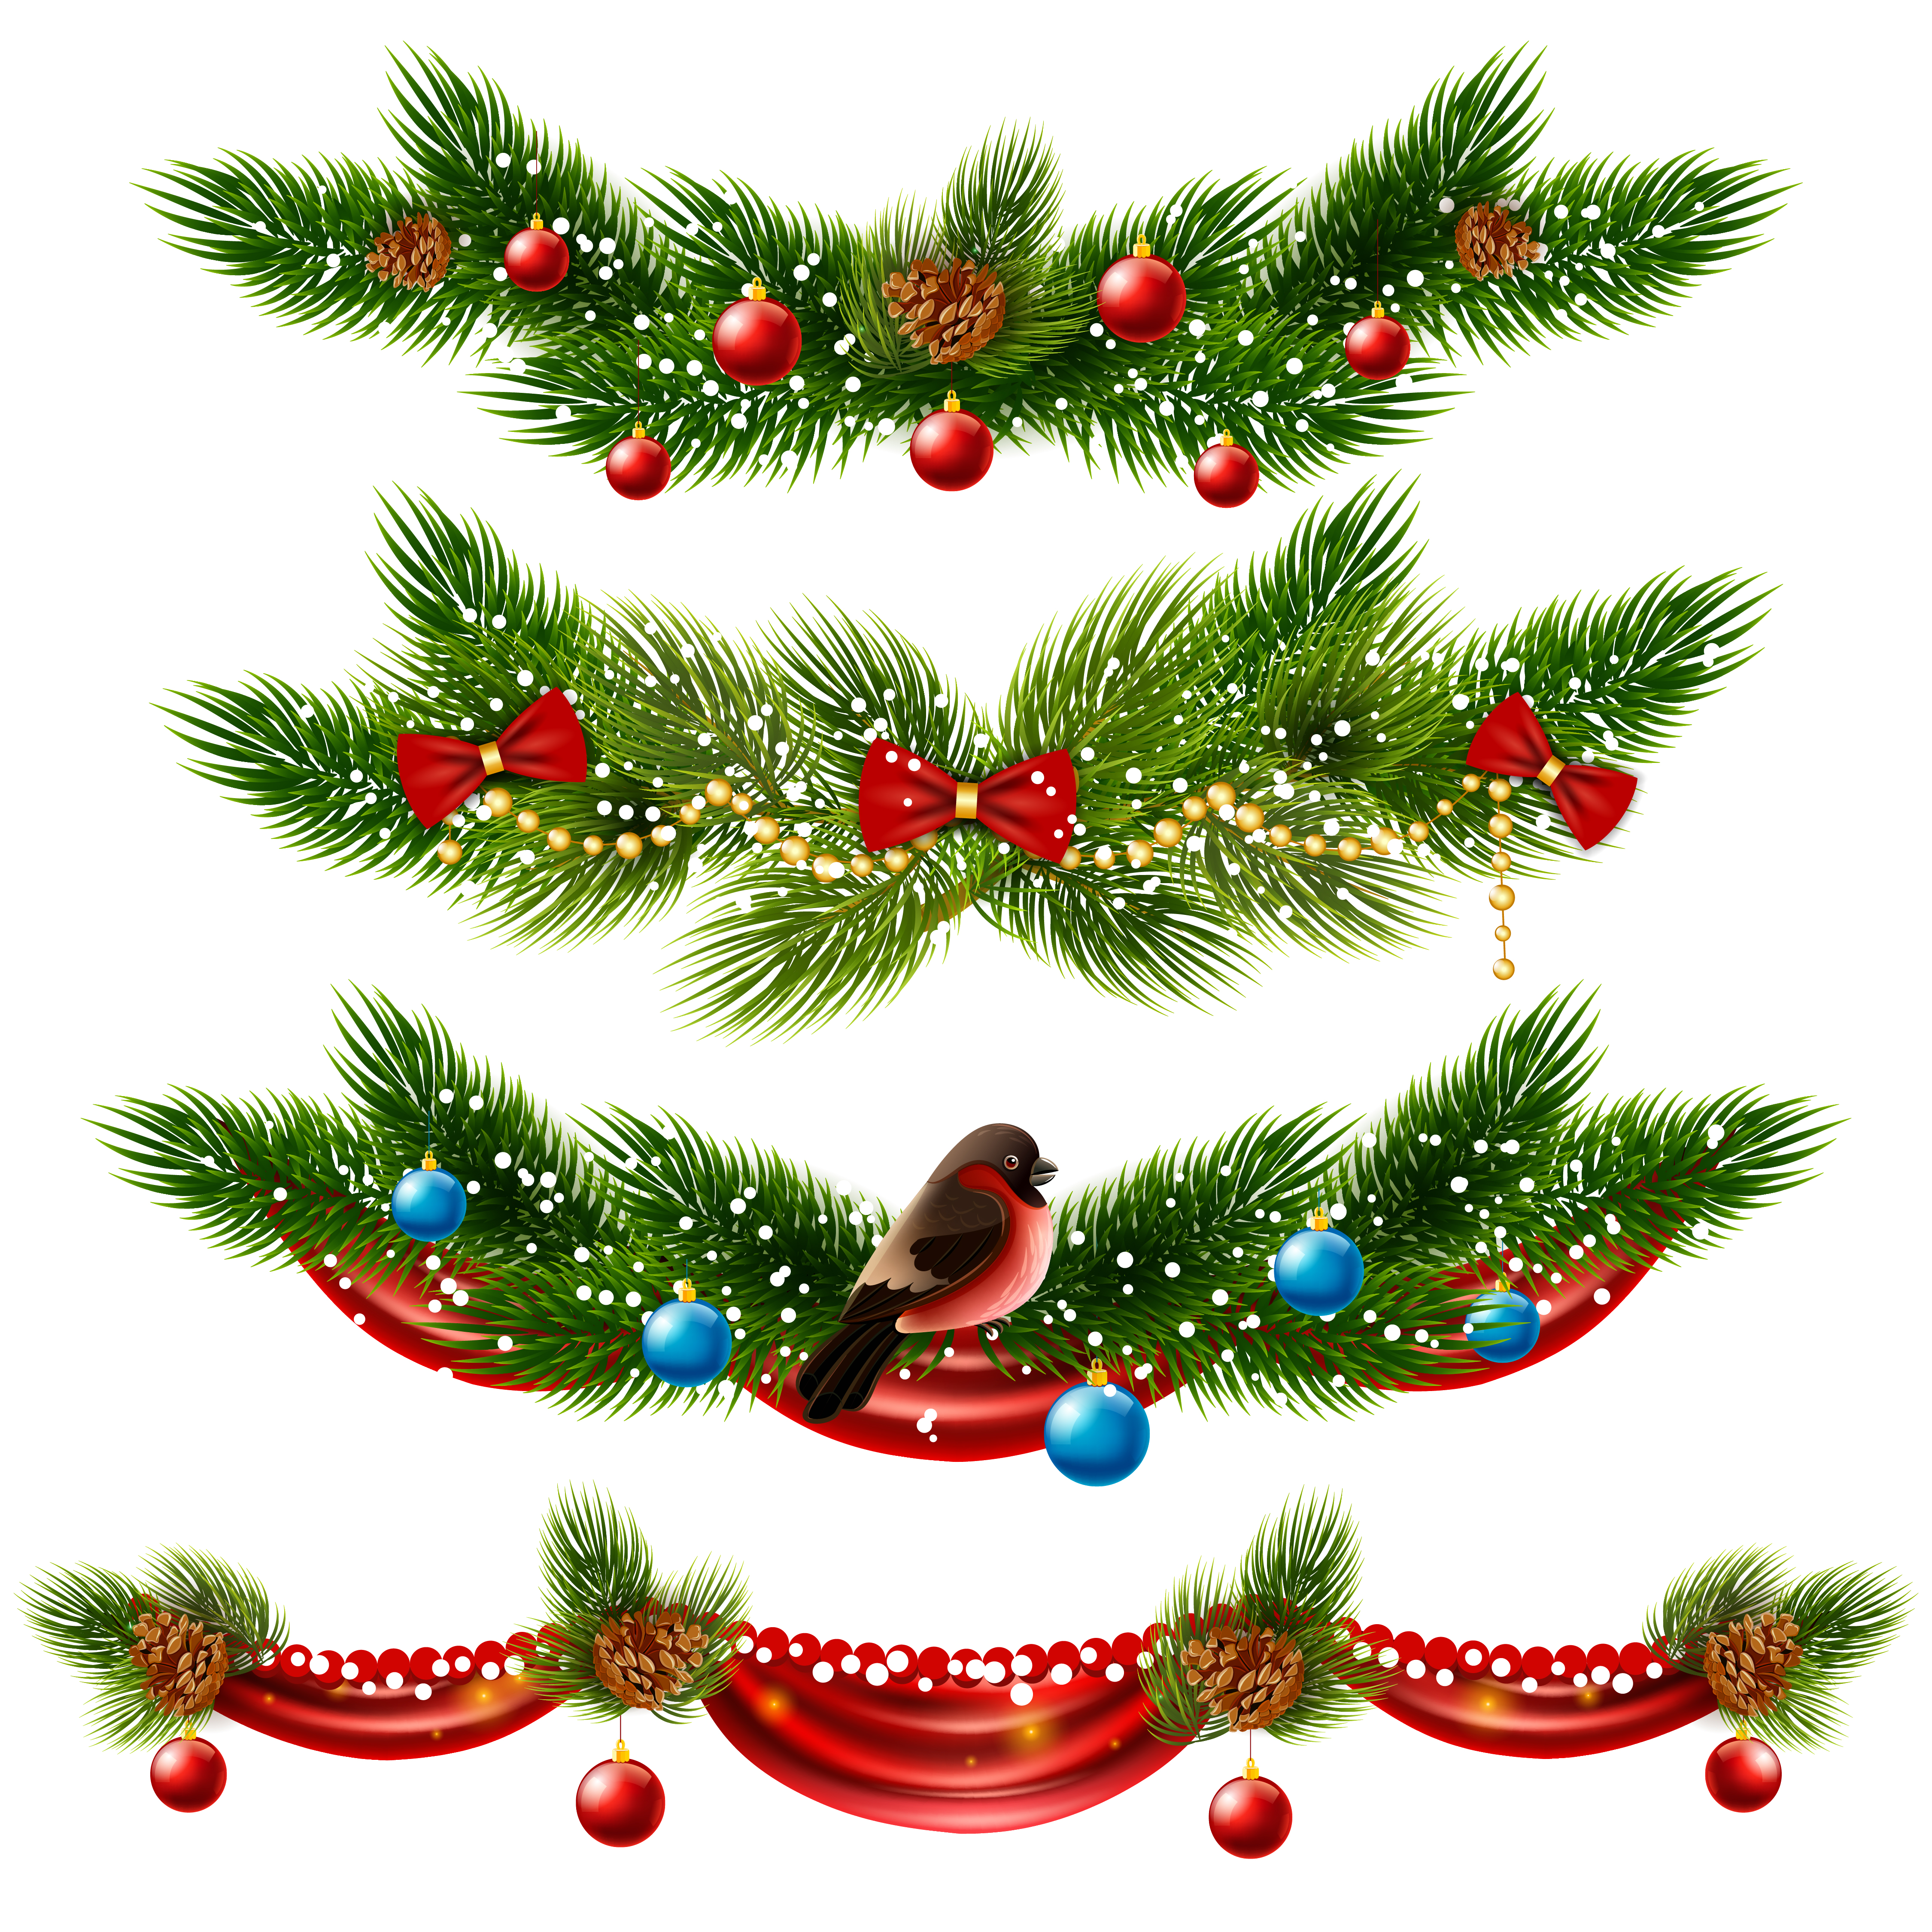 Christmas Borders Set - Download Free